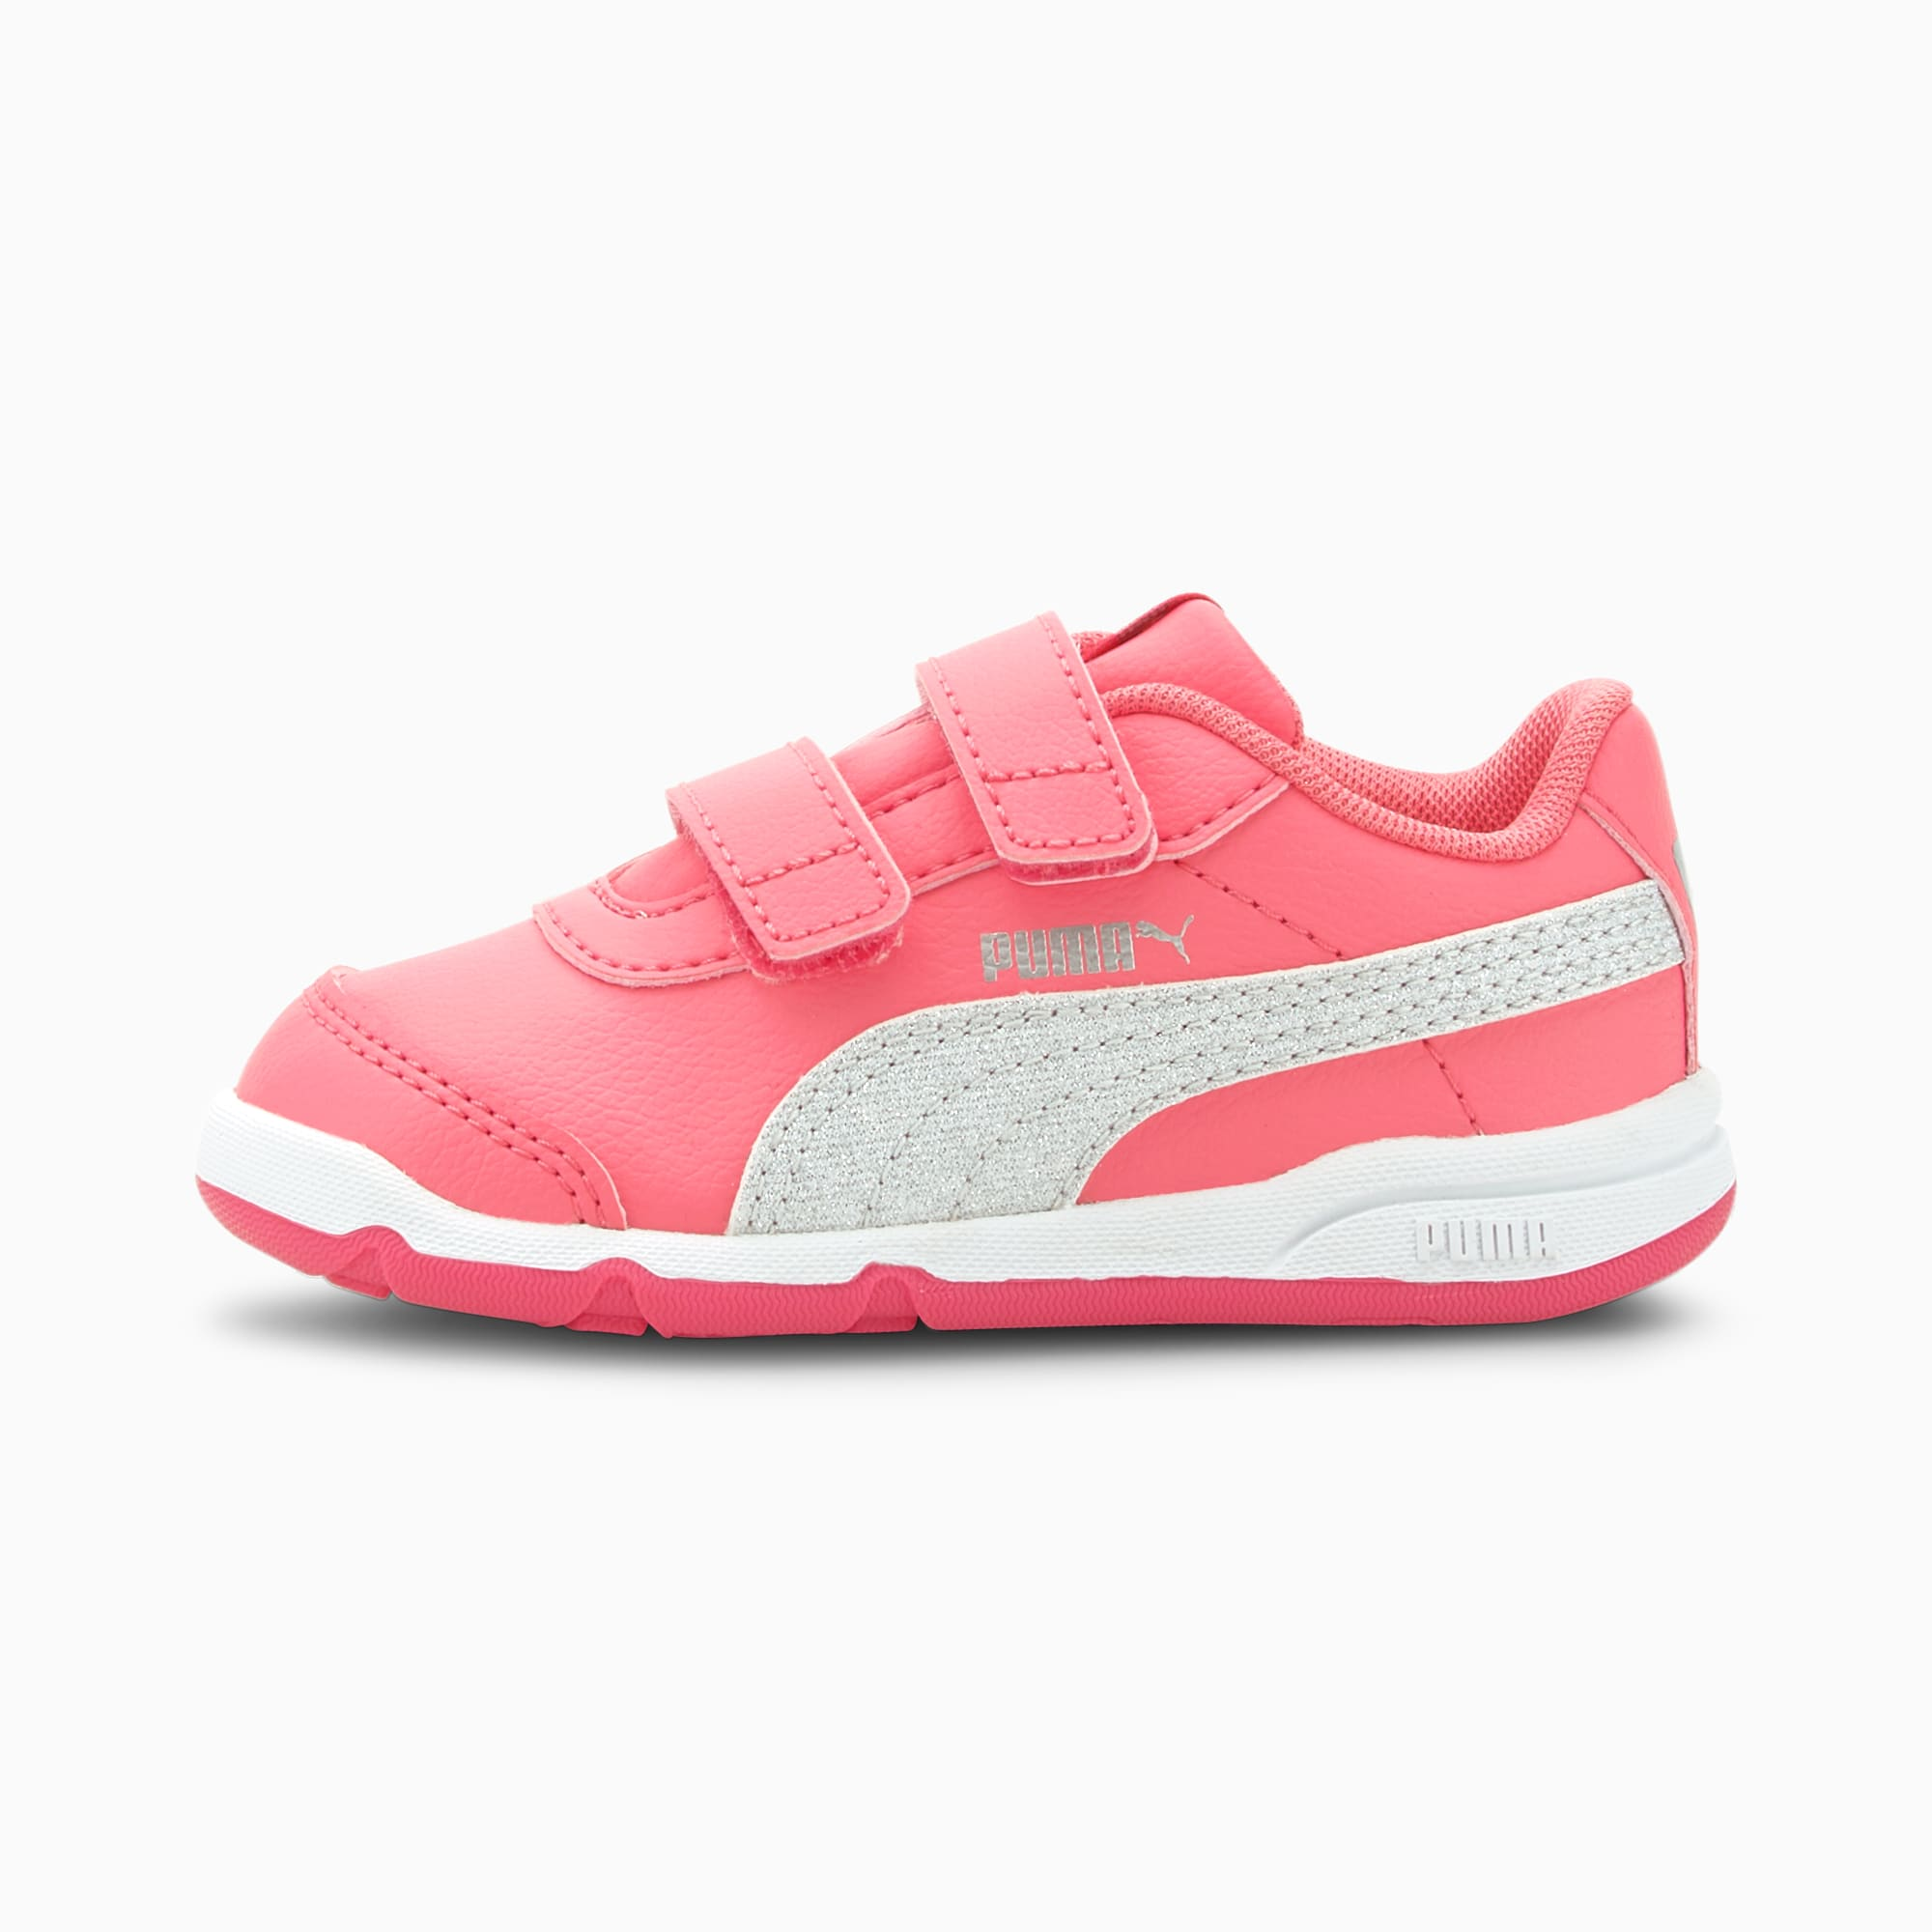 Stepfleex 2 SL VE Glitz Baby Girls' Trainers